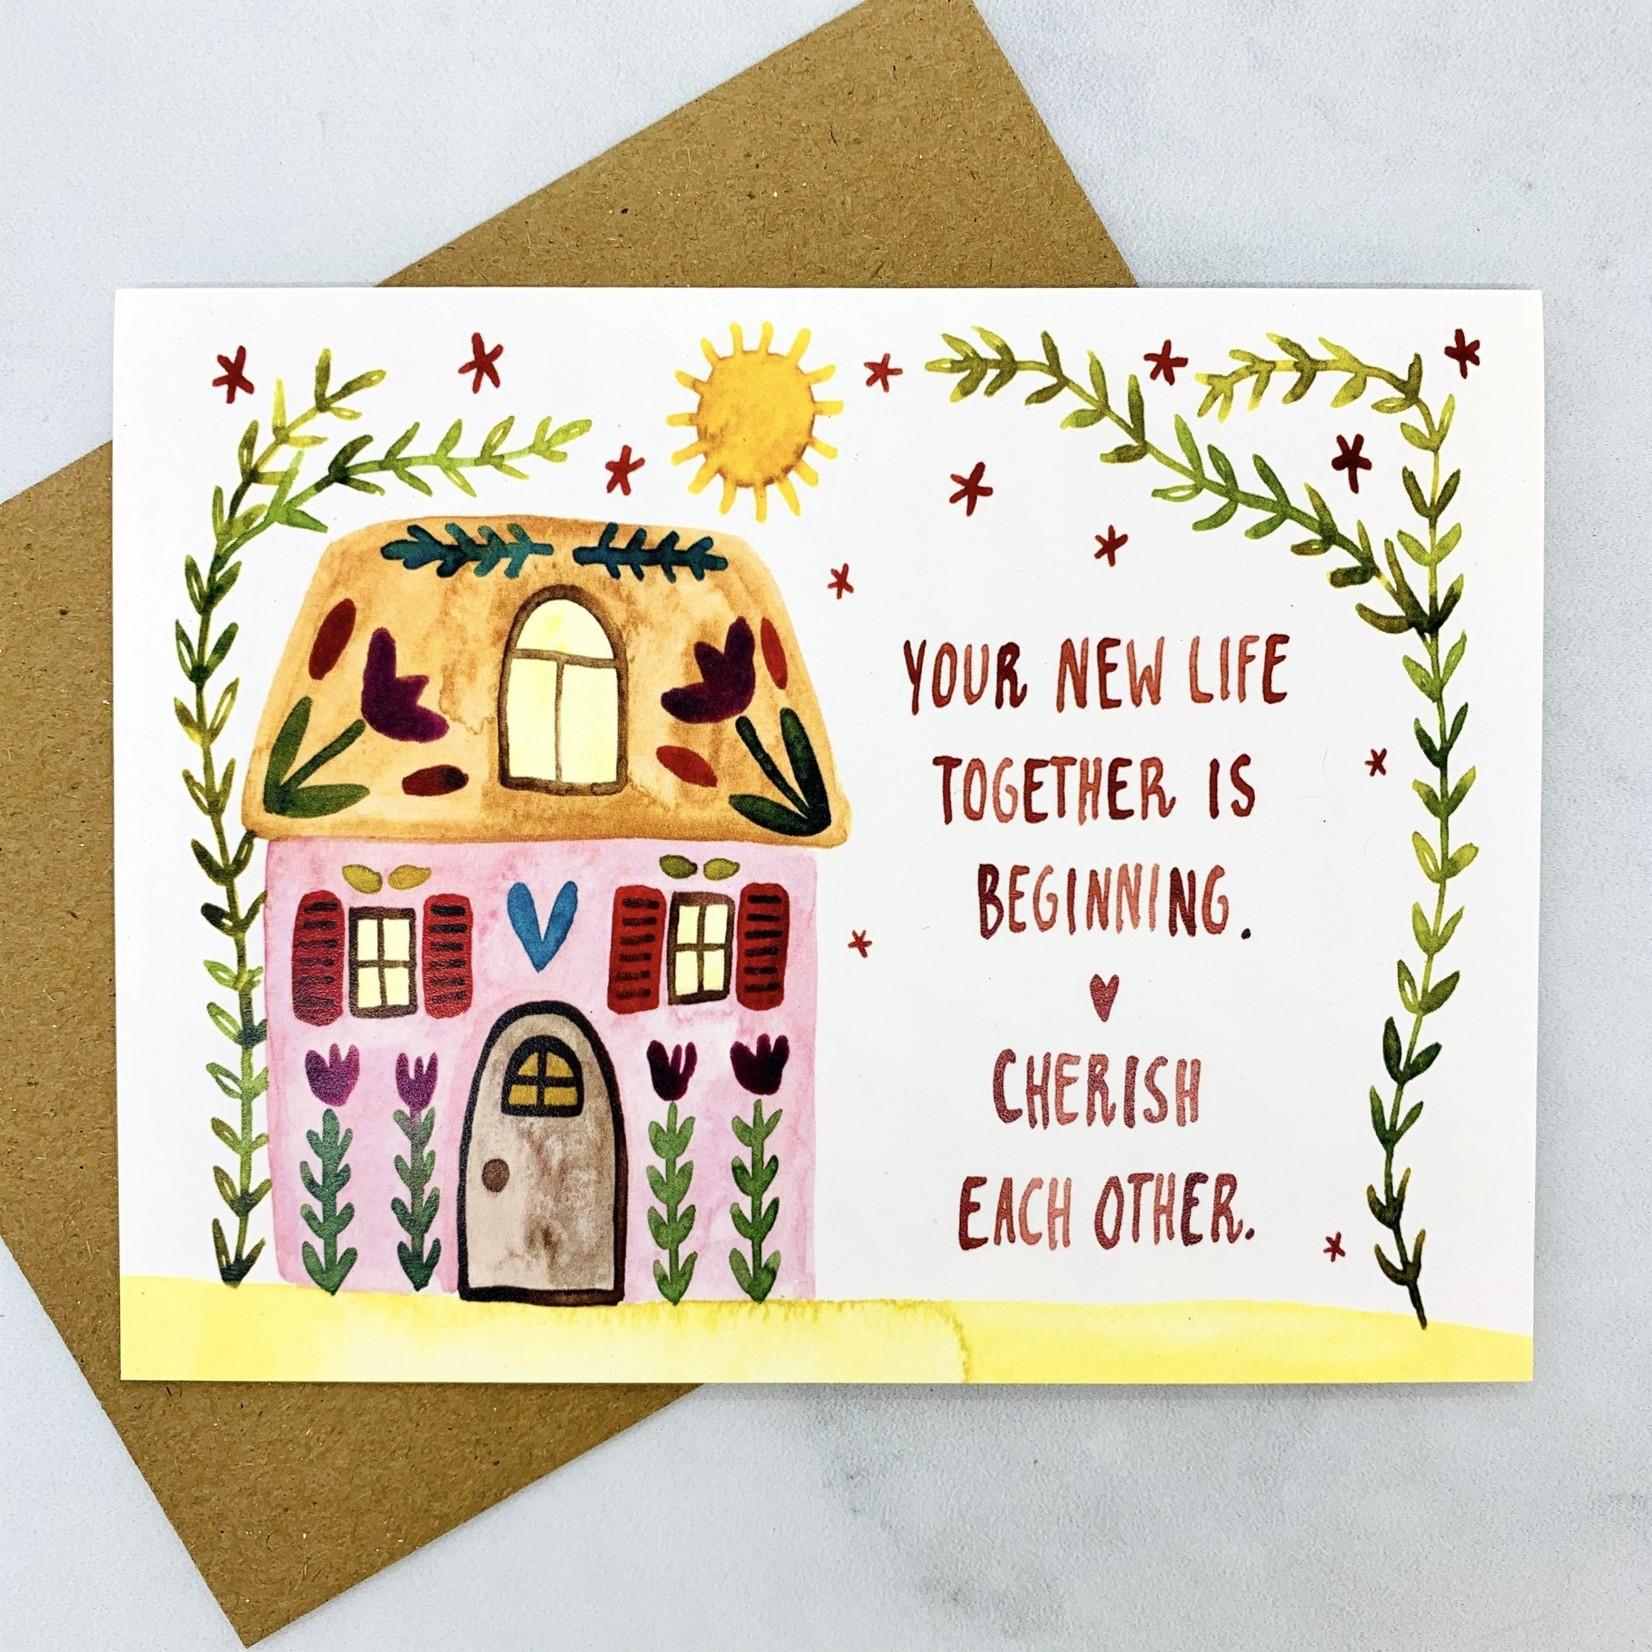 Cherish Each Other Card